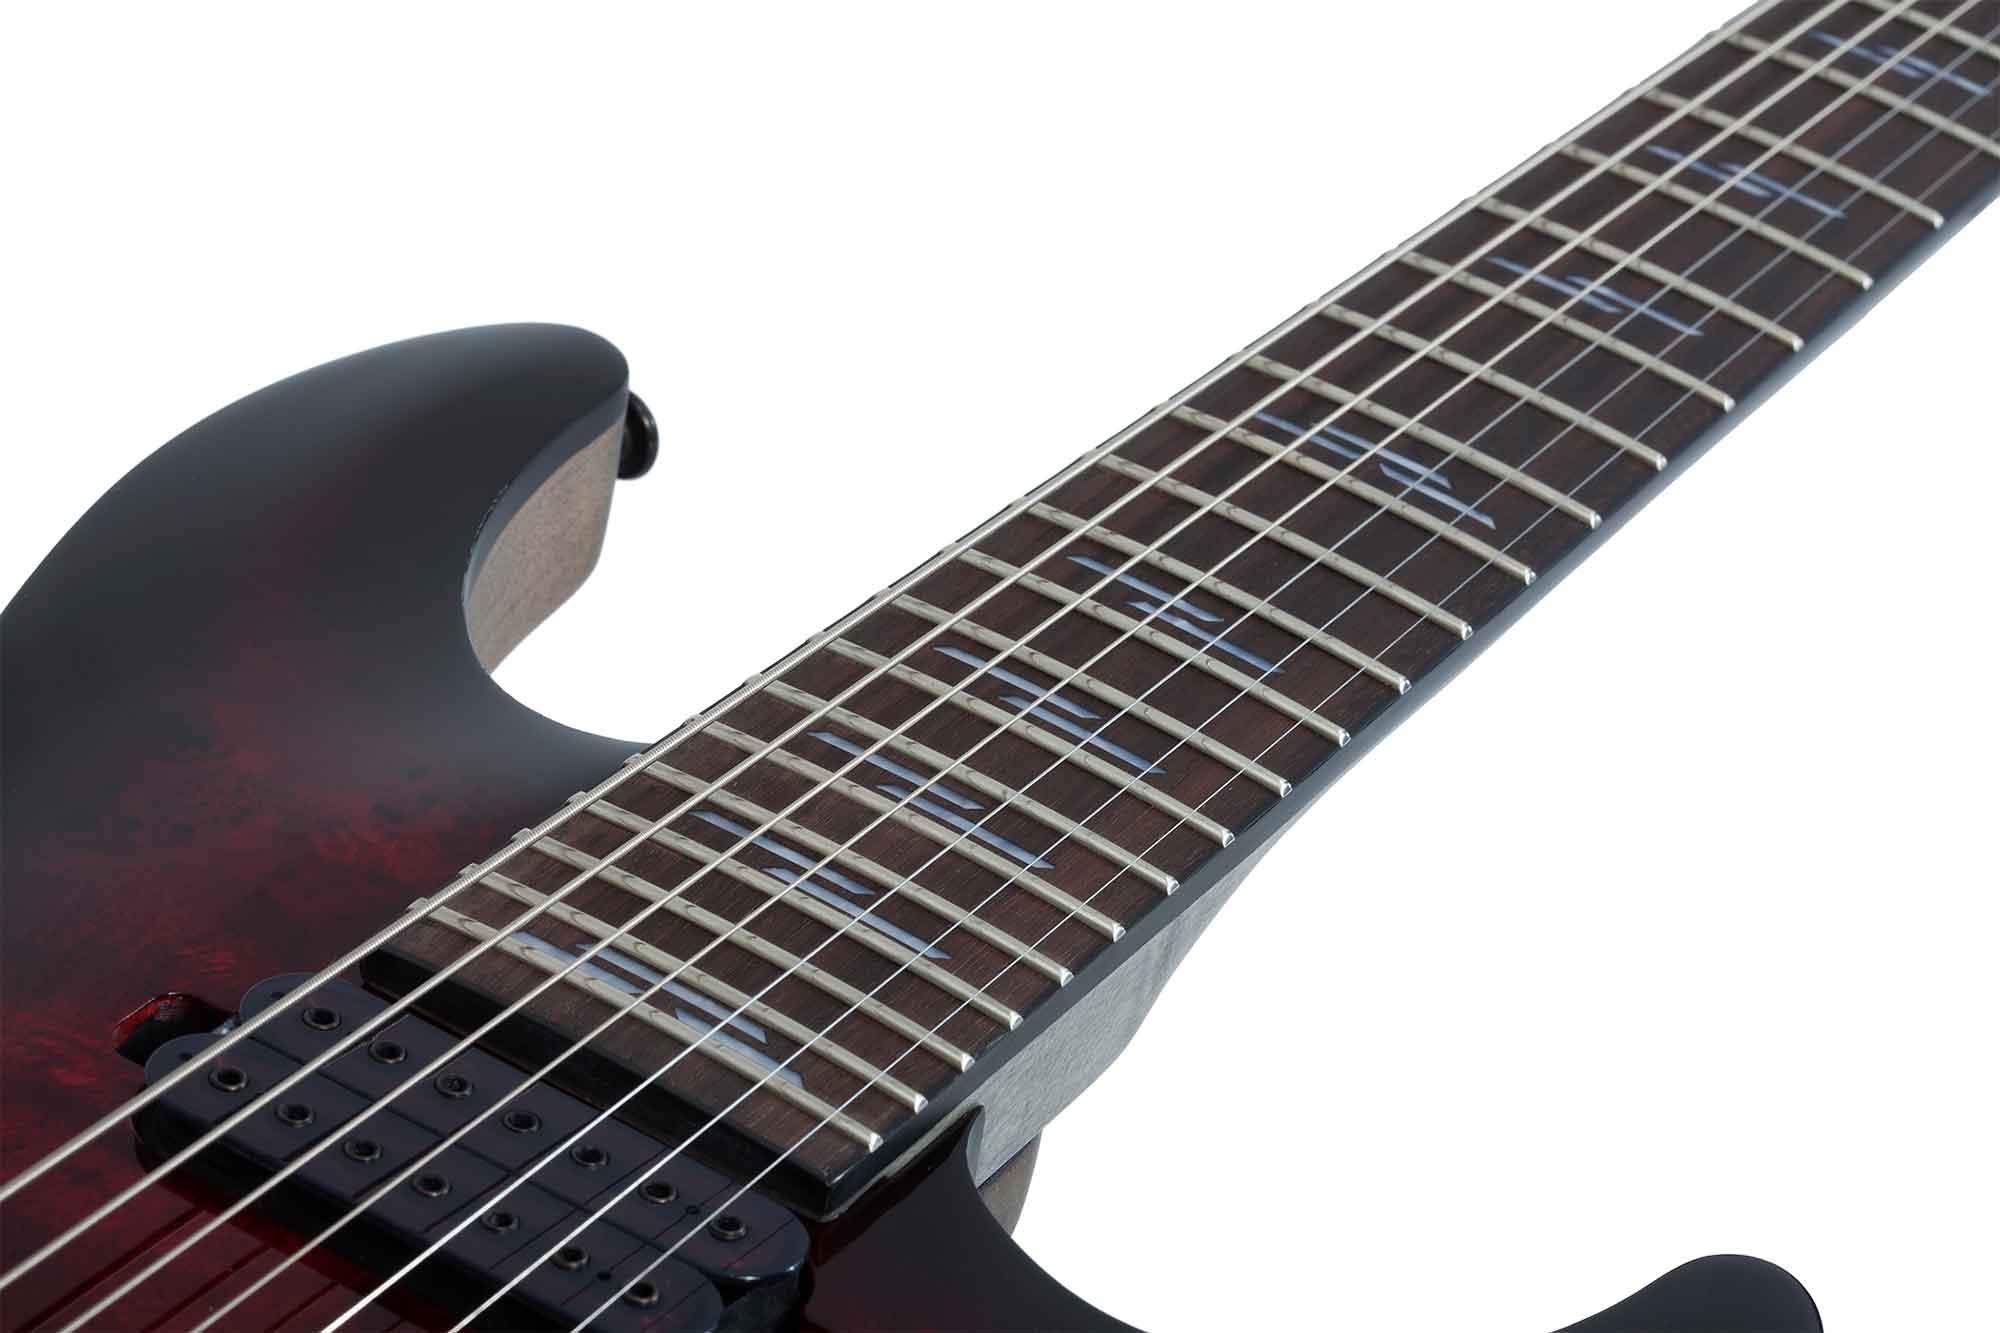 גיטרה חשמלית Schecter Omen Elite-7, Black Cherry Burst